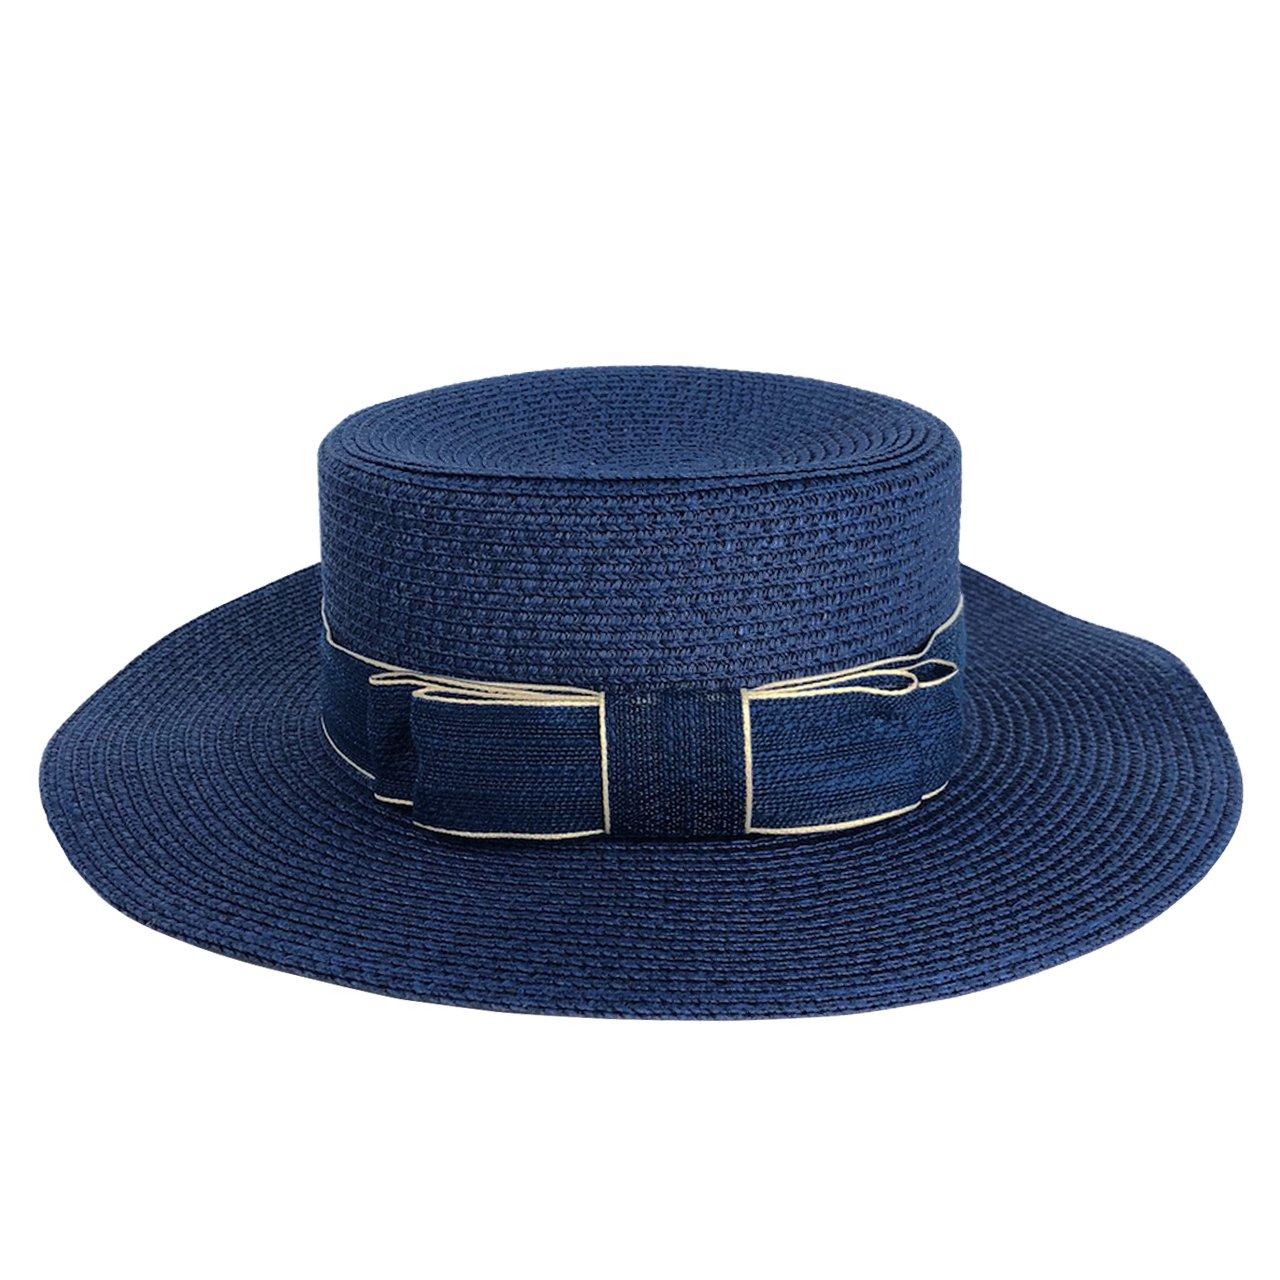 CHIC DIARY Women Bowknot Straw Hat Summer Fedoras Wide Brim Sun Hat QQUS07285